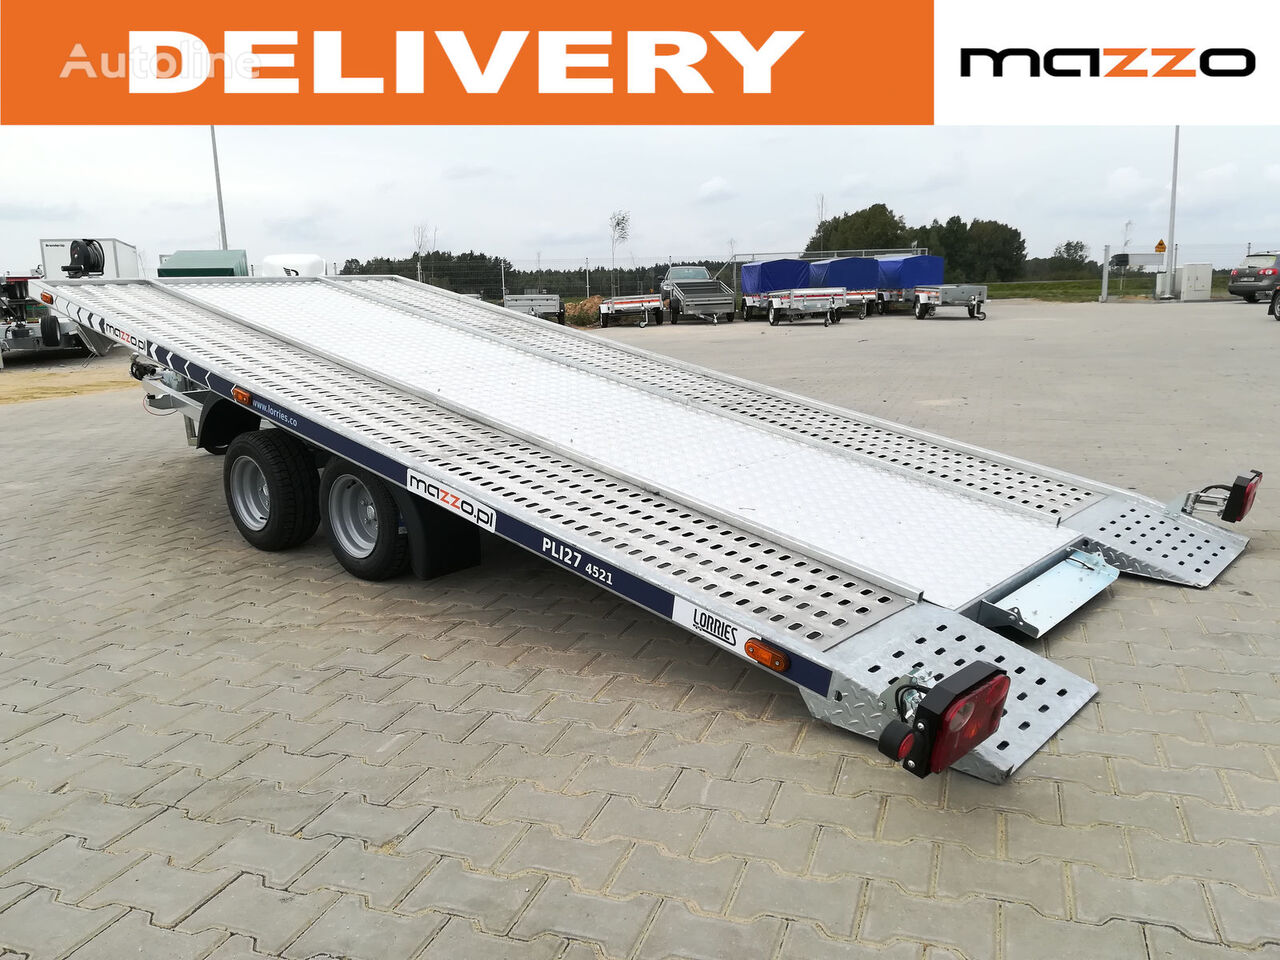 new PLI27-4521Tilted trailer 2700kg 450x210cm car transporter trailer